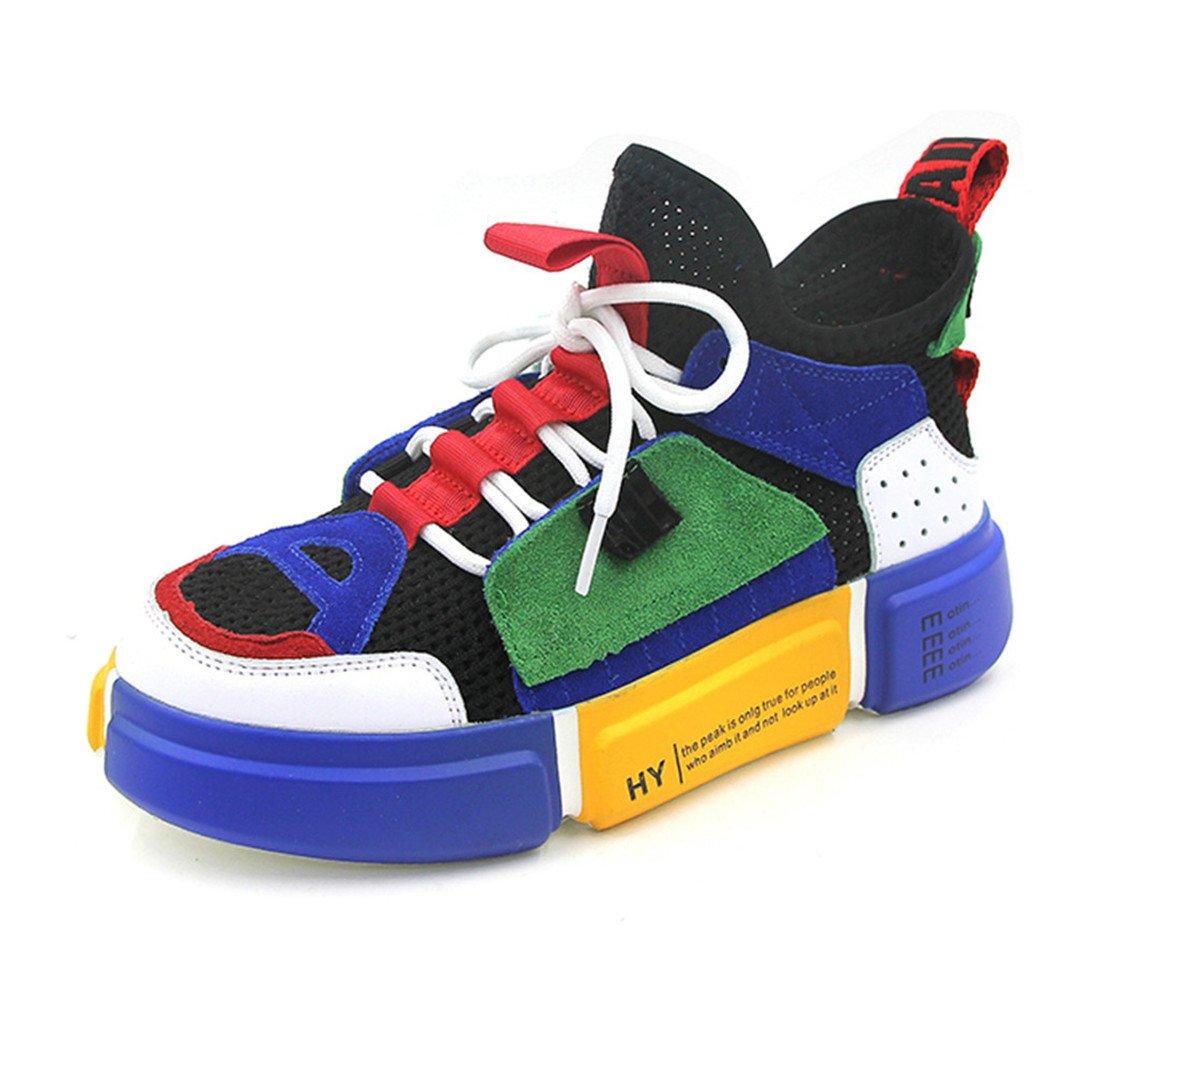 LSGEGO Women's Casual Sneaker Running Shoes Women Walking Sports Shoes Girl Style Fashionable Outdoor Lightweight